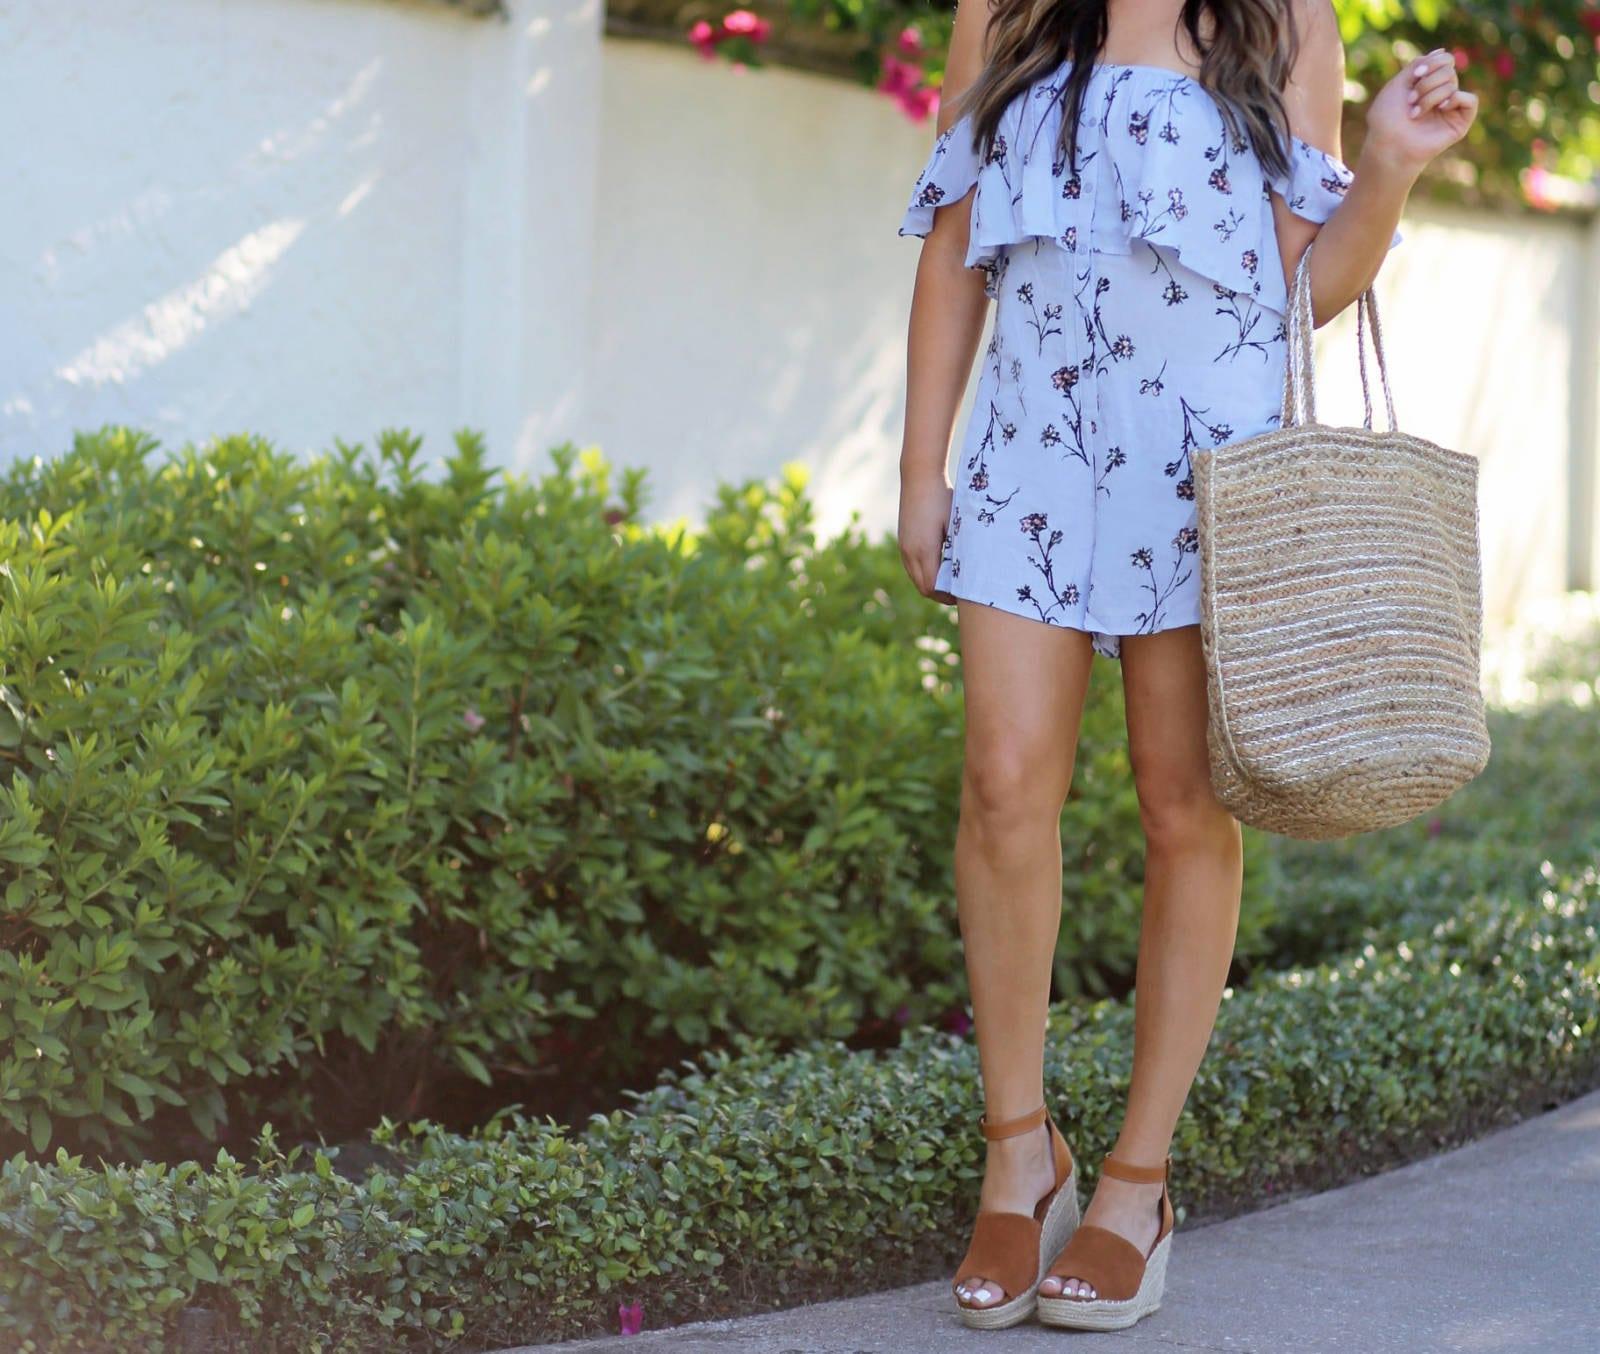 casual floral romper | Mash Elle beauty blogger | woven purse | wedges | flowers